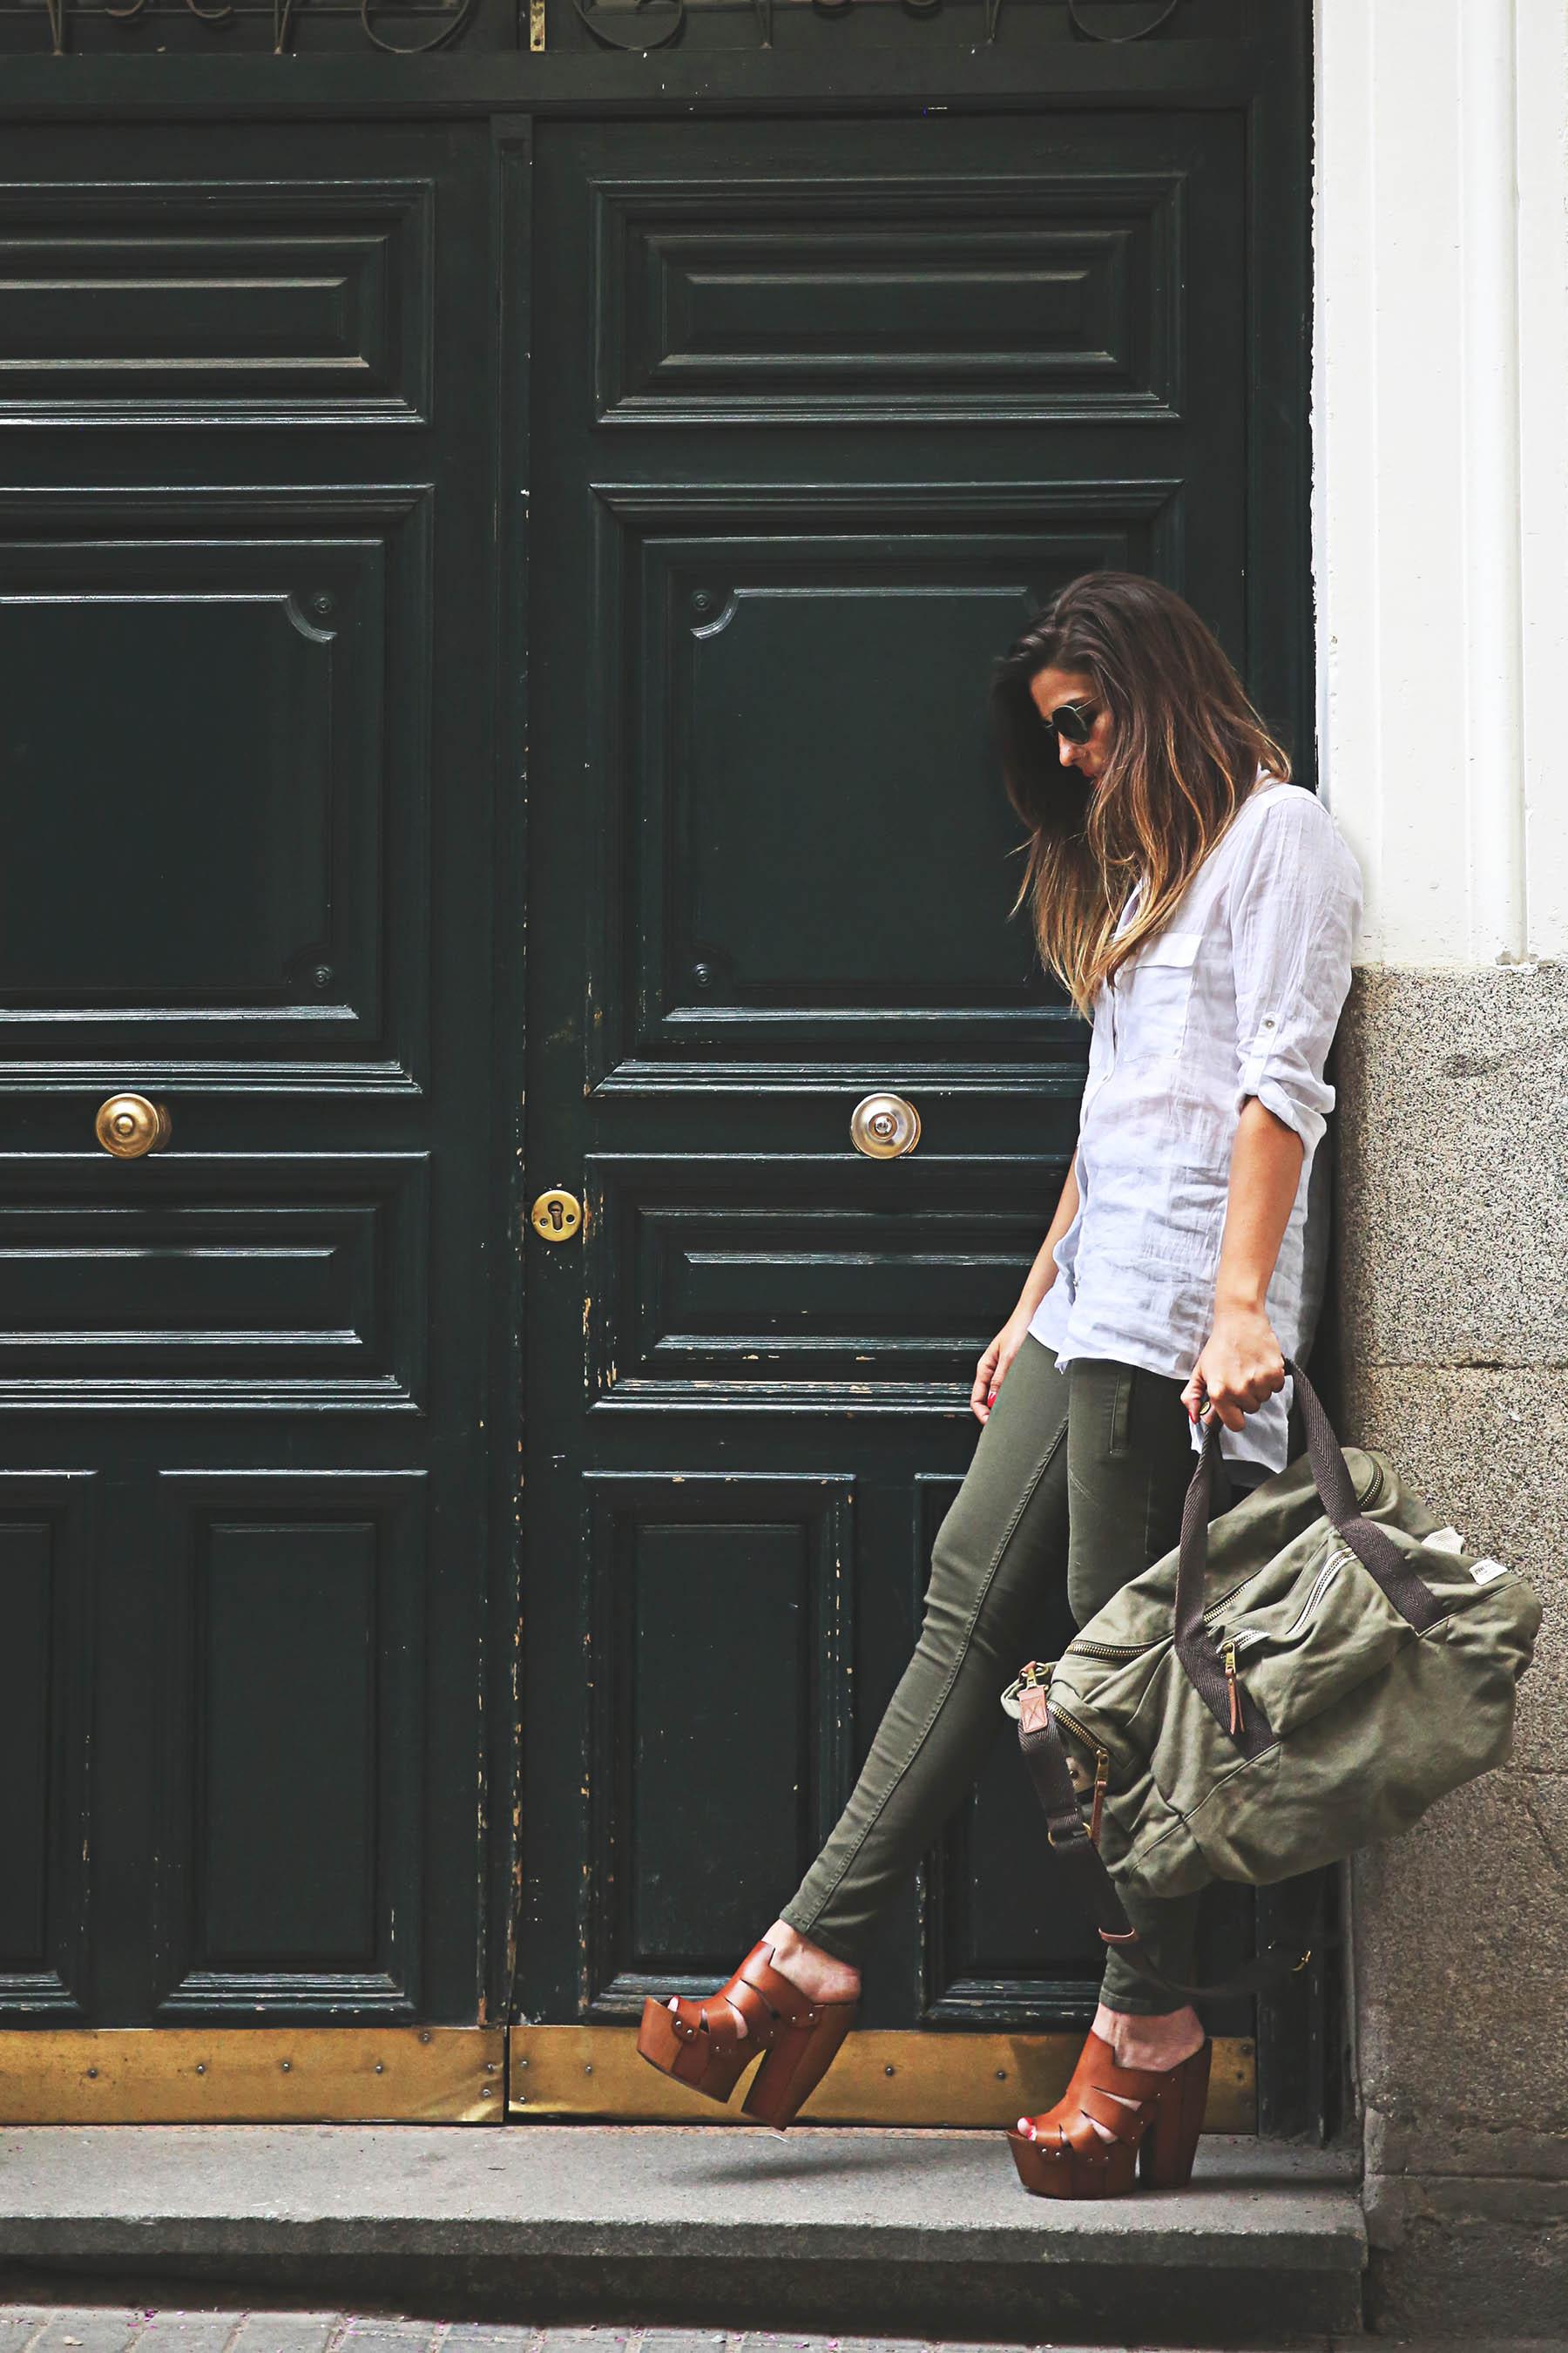 trendy-taste-look-outfit-street-style-steve-madden-ootd-blog-blogger-fashion-spain-moda-españa-safari-traveling-viaje-bolsa-bag-khaki-caqui-pants-sandalias-zuecos-2